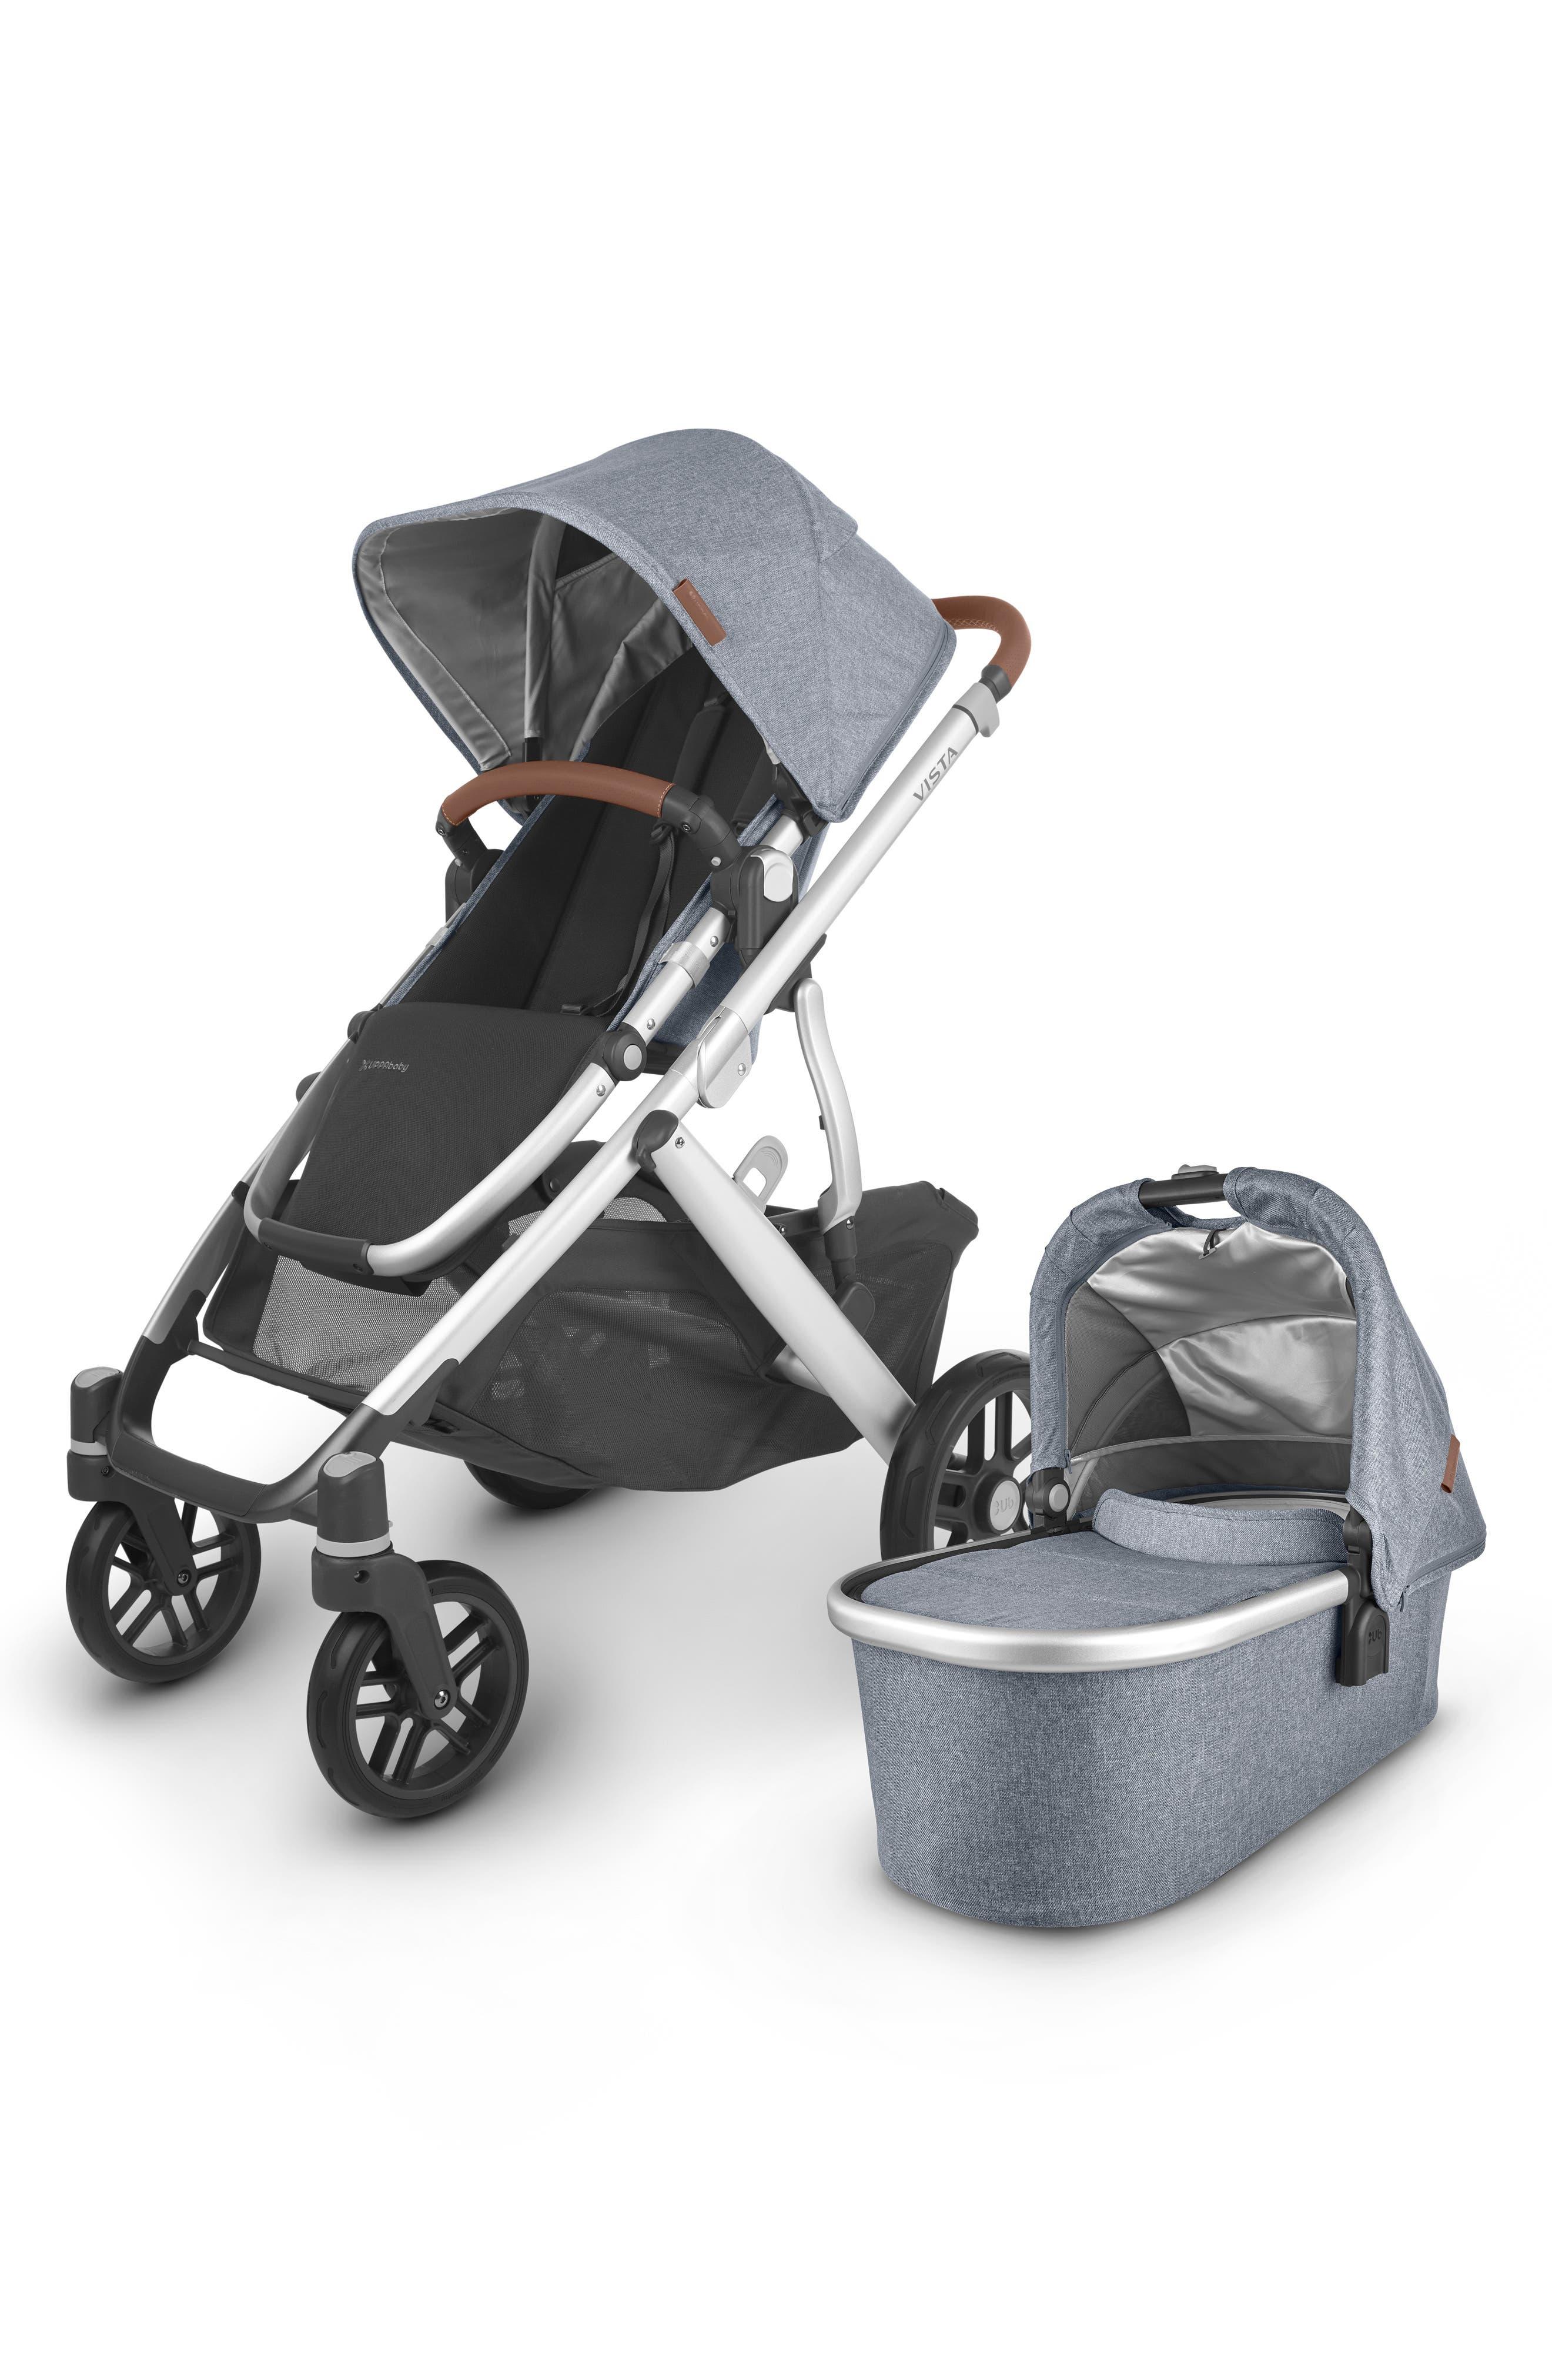 UPPAbaby Infant Uppababy Vista V2 Stroller With Bassinet, Size One Size - Blue